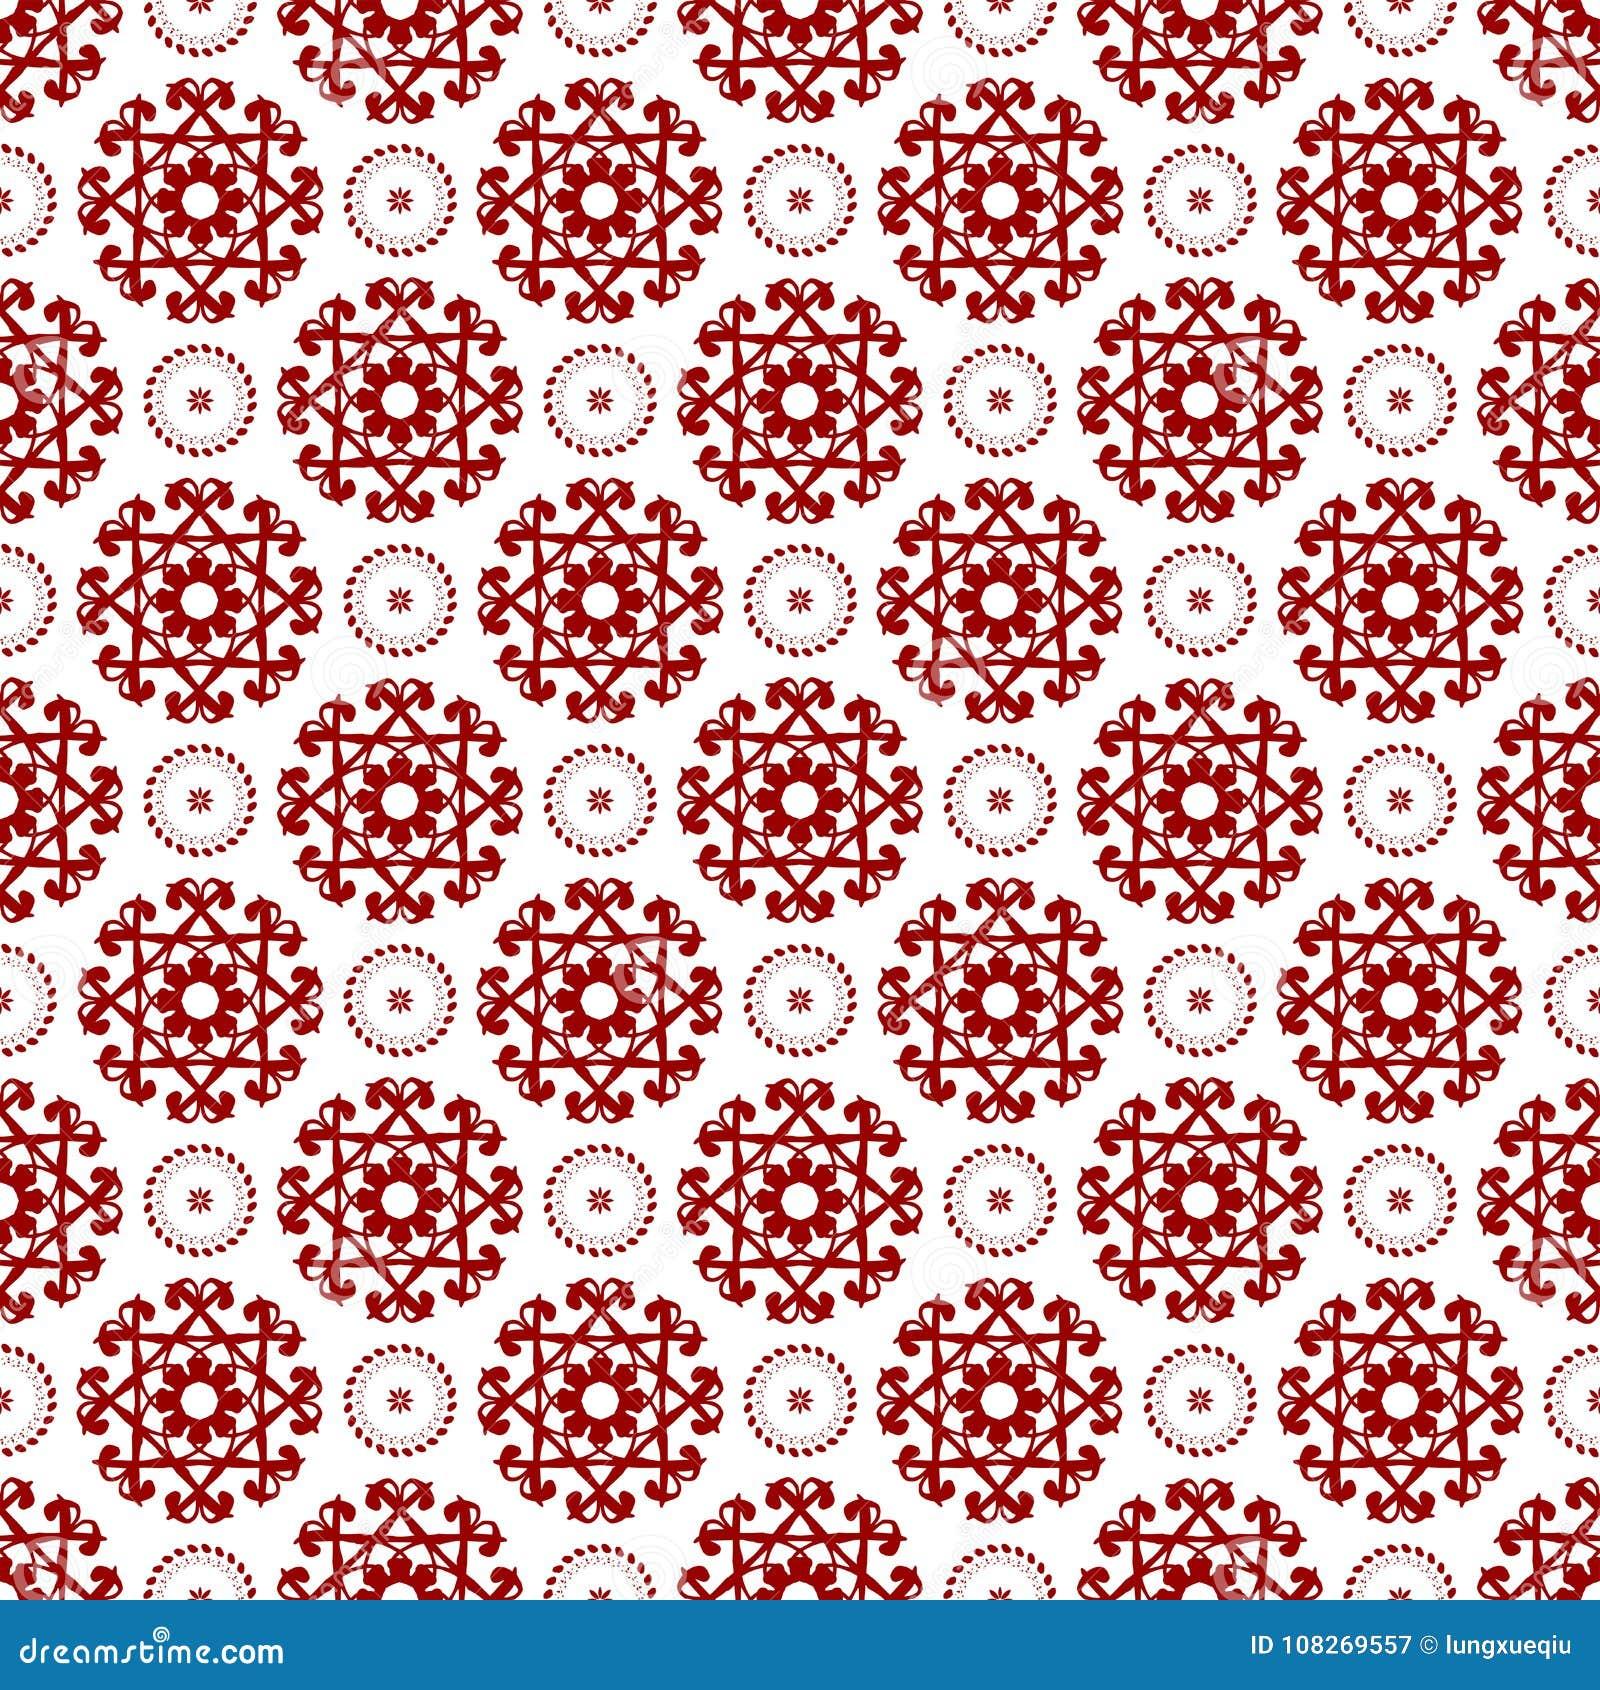 Abstract Ornamental Oriental Floral Seamless Royal Vintage Arabic